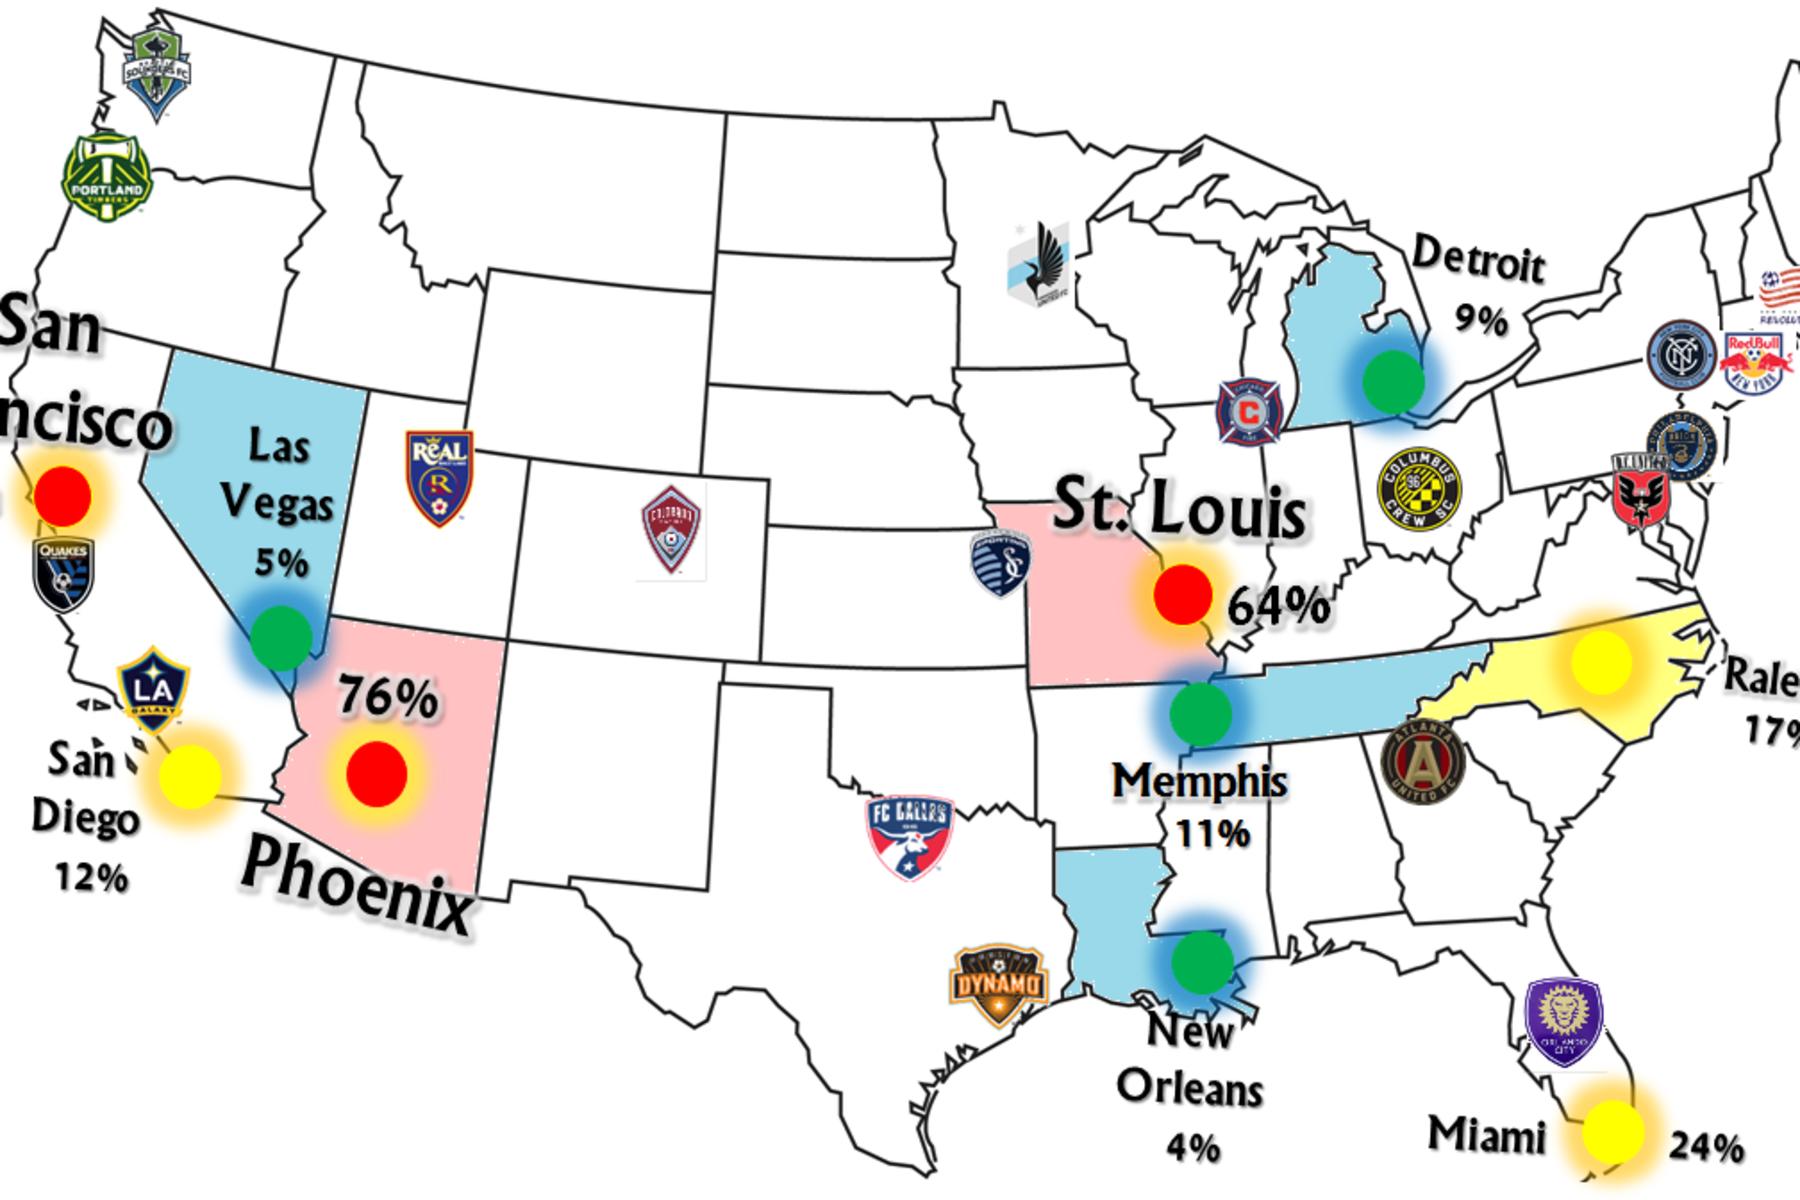 MLS Teams on the Map @MLS #9ine #FollowLiveShare